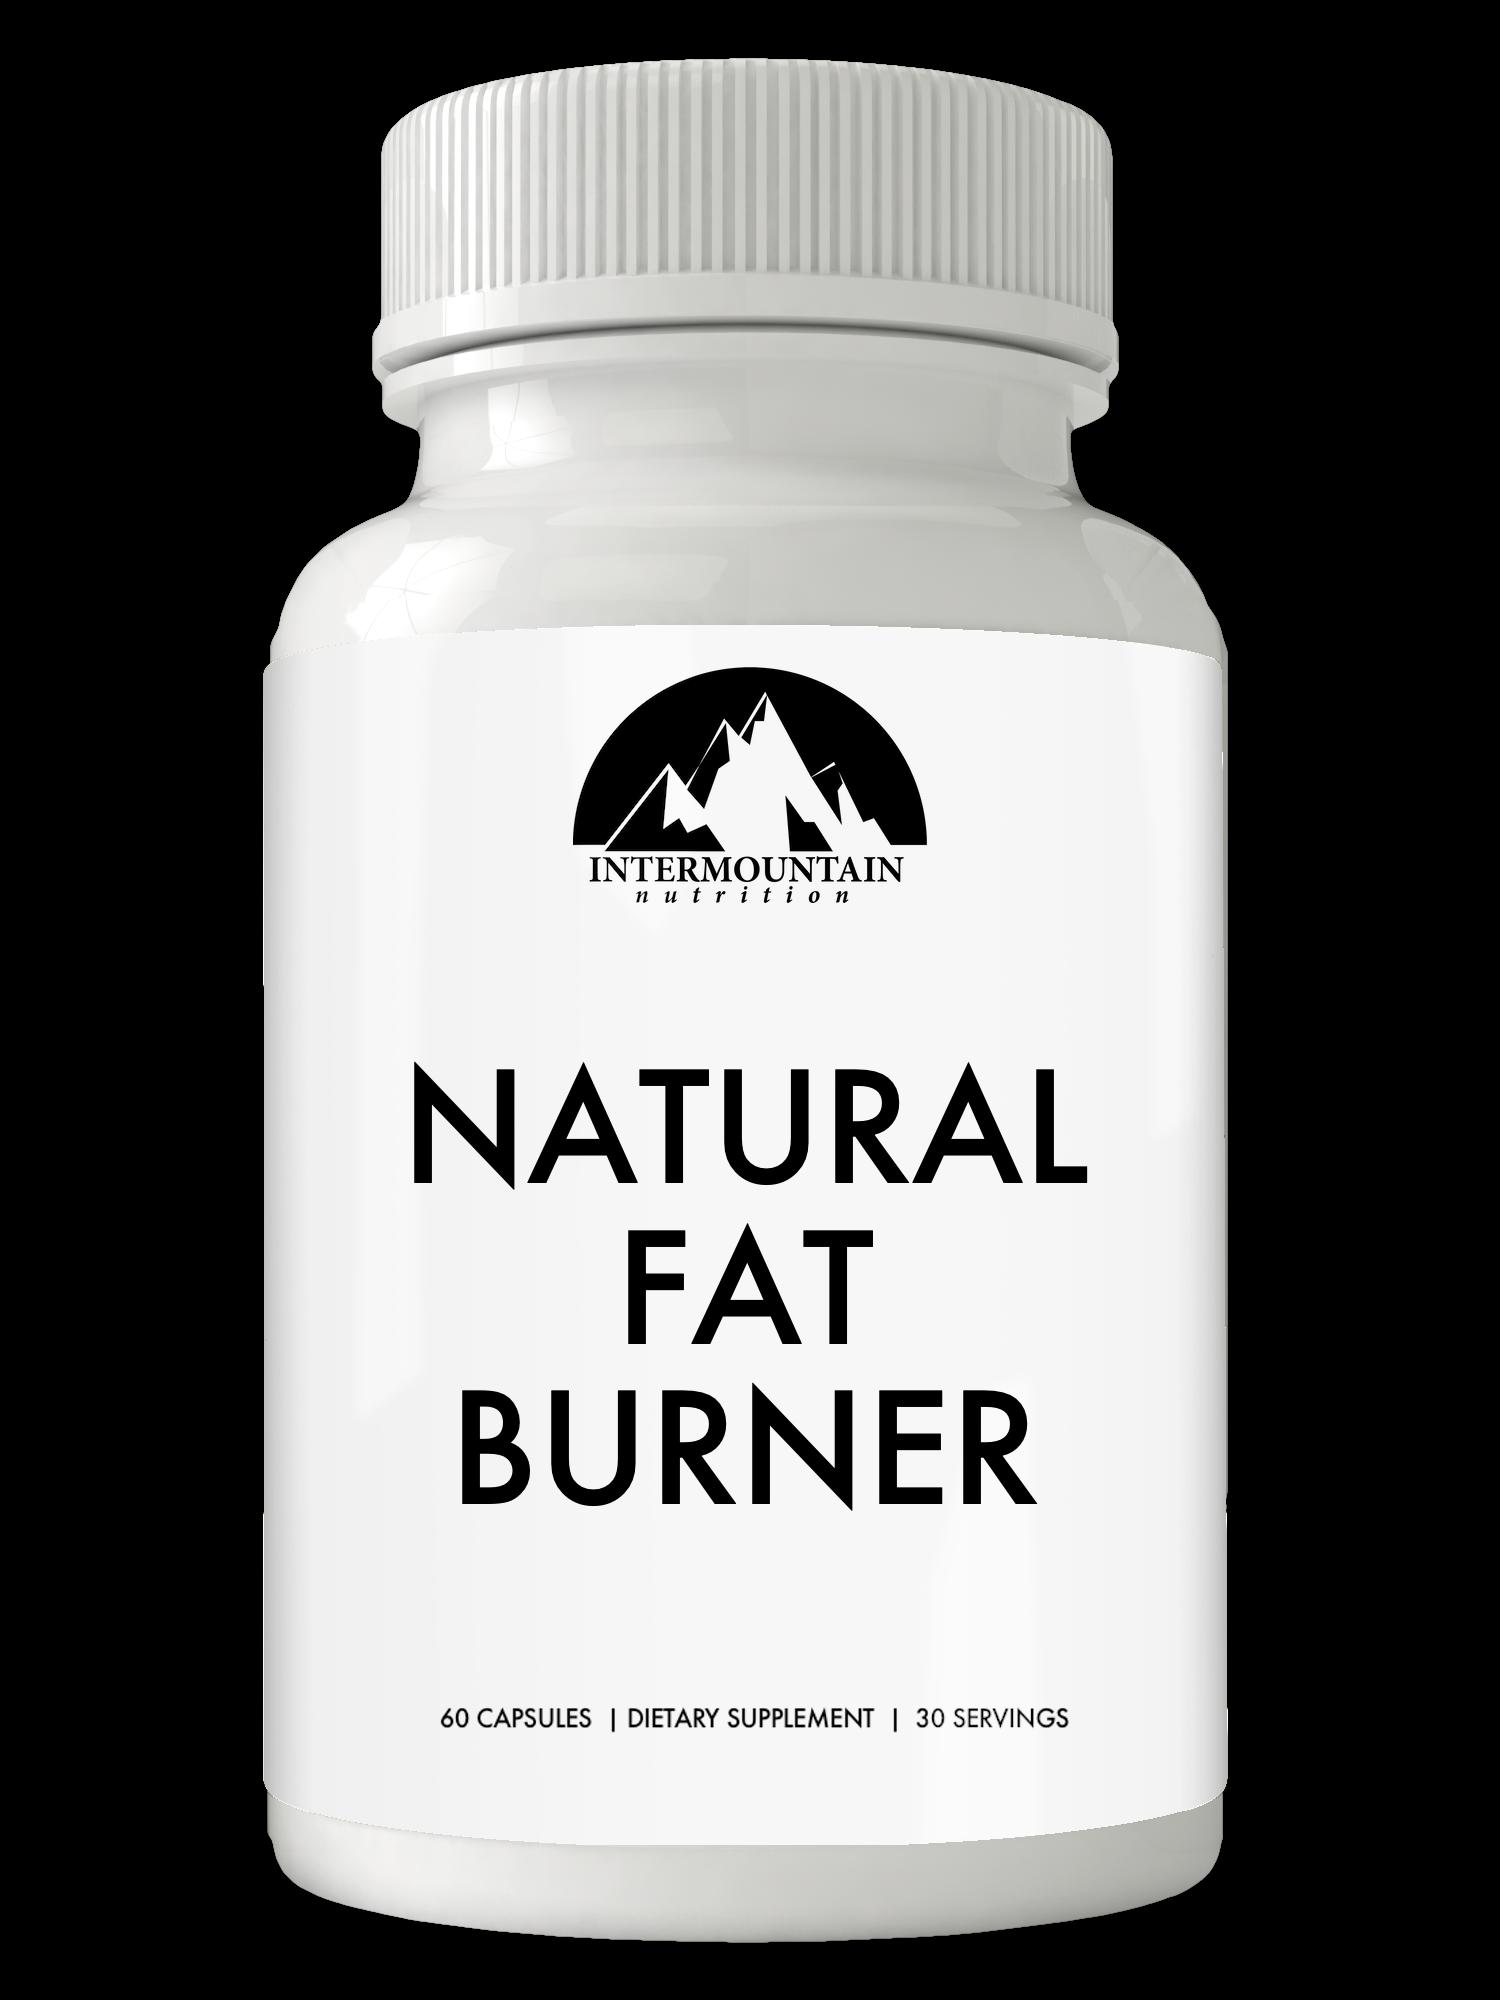 IMN - NATURAL FAT BURNER.png